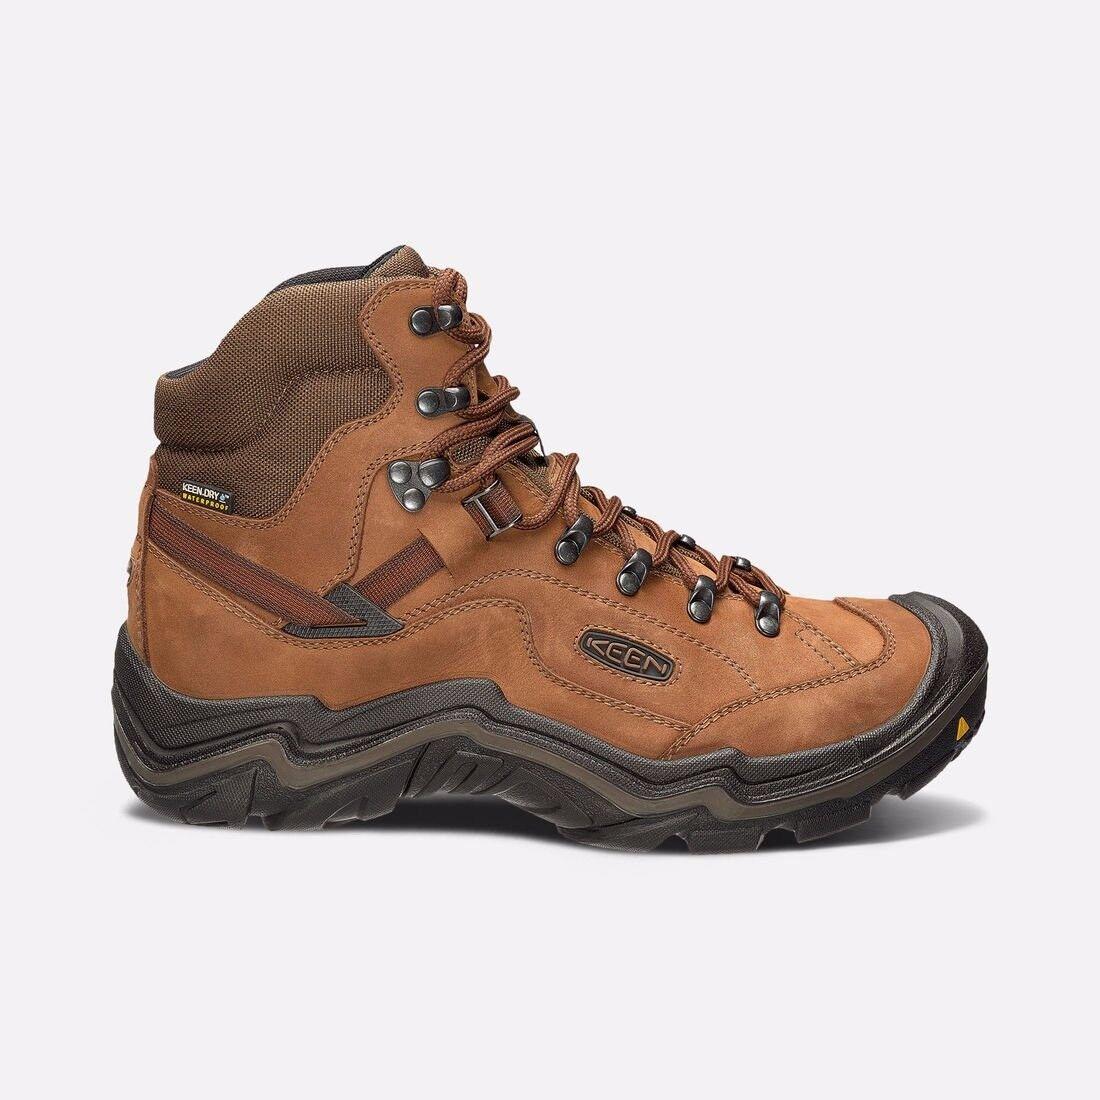 Keen Galleo Mid Waterproof Mens Walking Boots- Dark Choc (Size 7) RRP 9c26e4f52